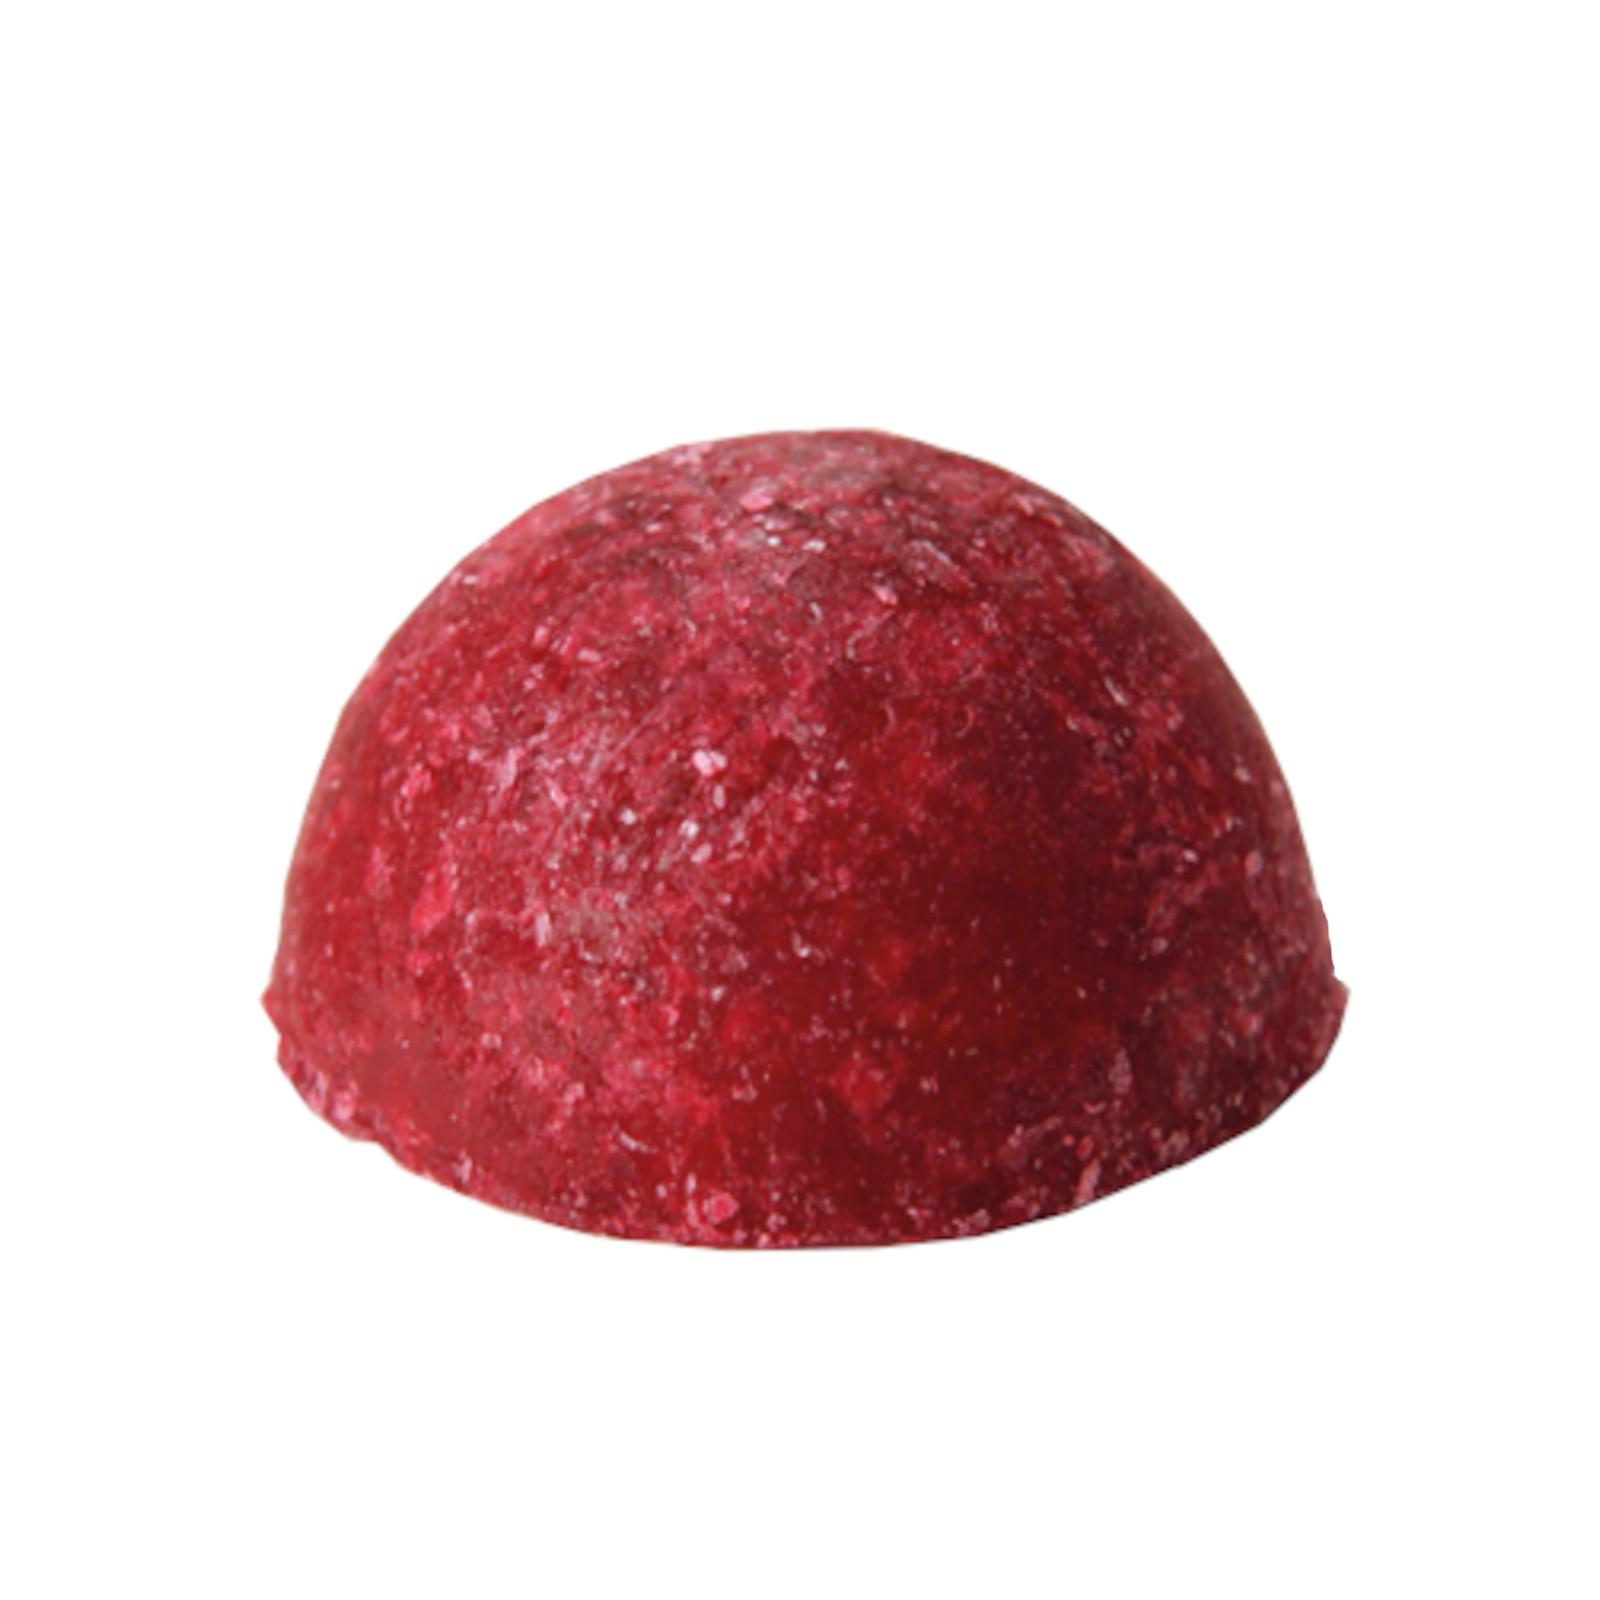 Kerzenfarm Kapsle do aromalampy, Red Berries 1 ks